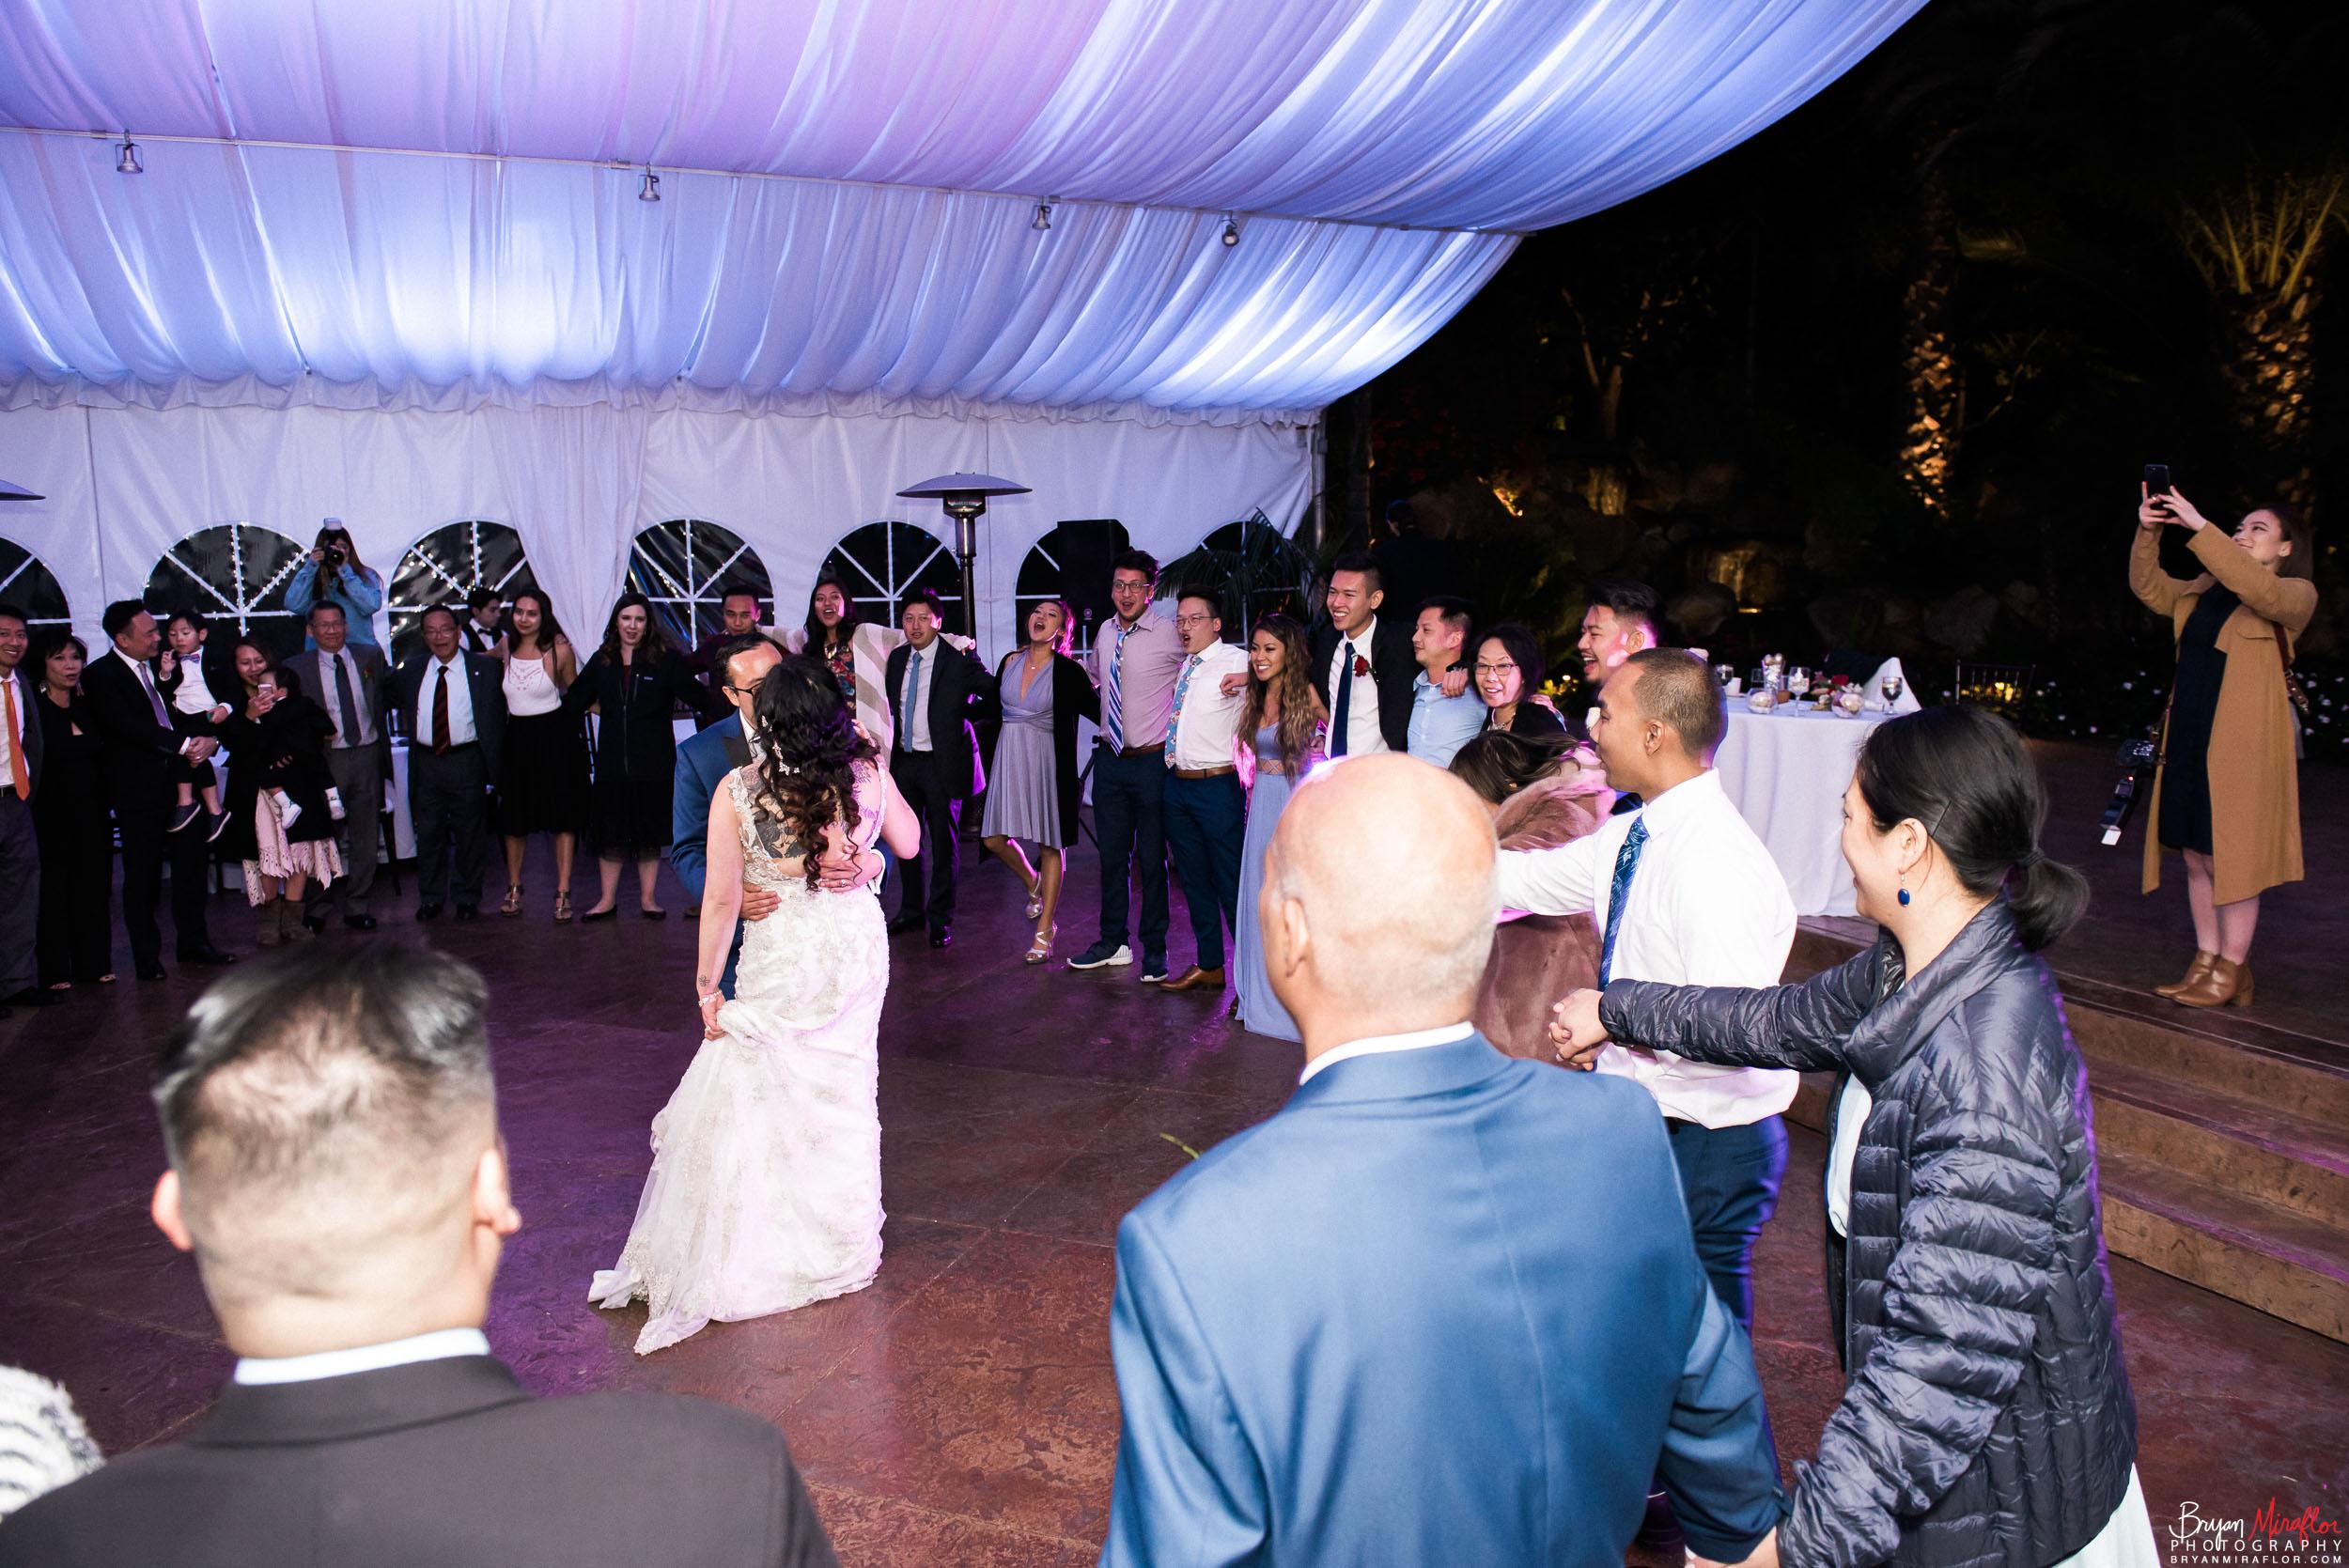 Bryan-Miraflor-Photography-Hannah-Jonathan-Married-Grand-Traditions-Estate-Gardens-Fallbrook-20171222-222.jpg